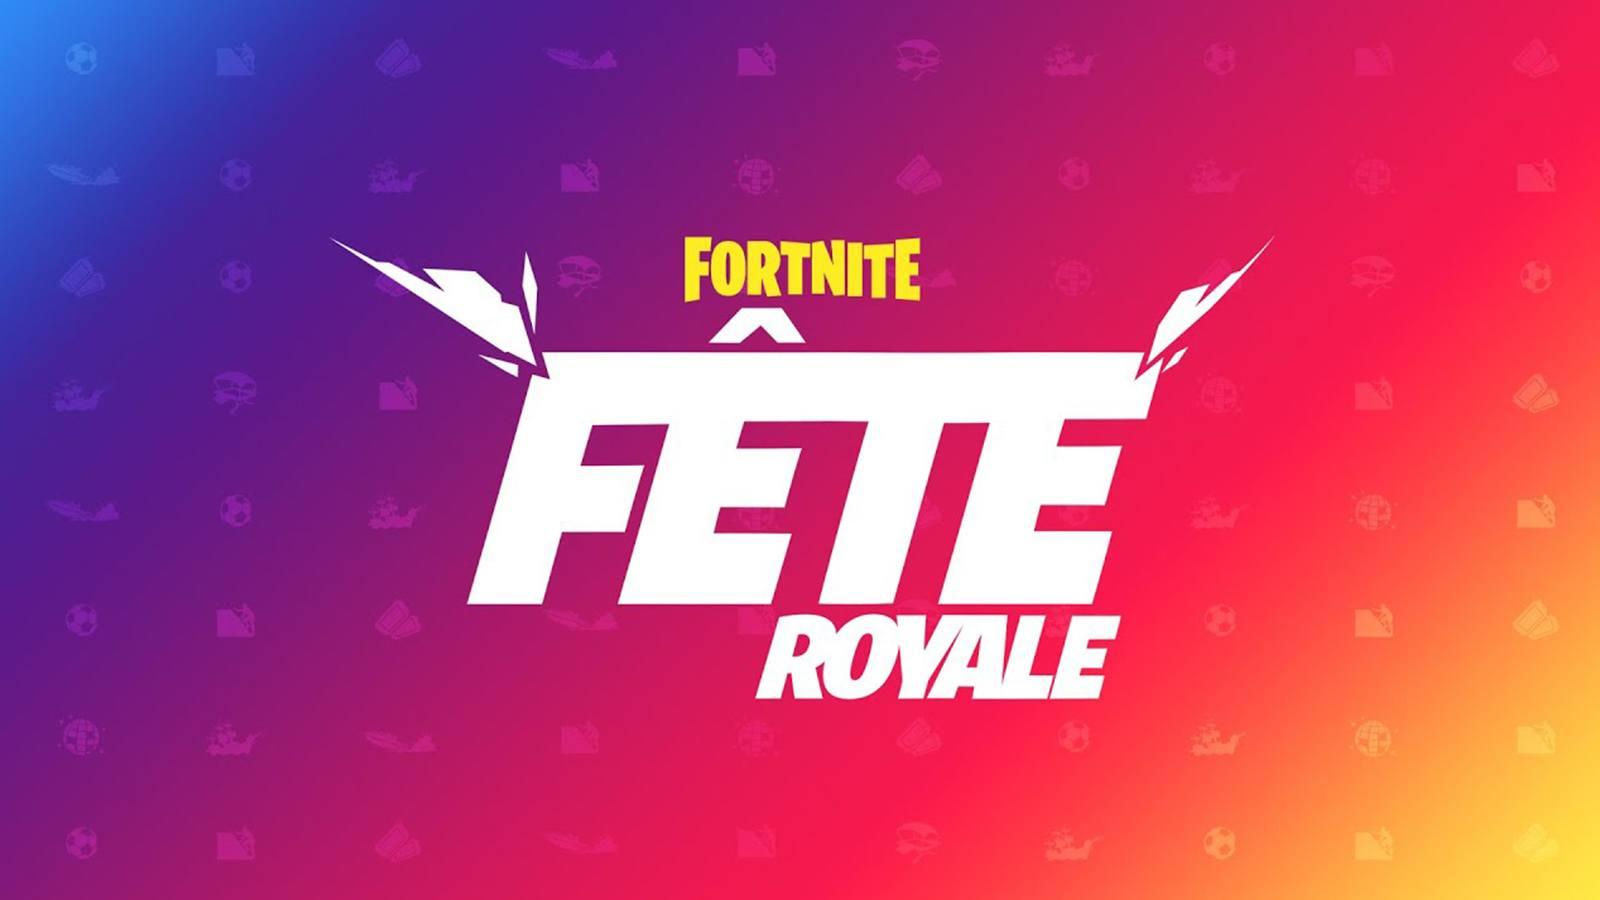 Fortnite Fête Royale